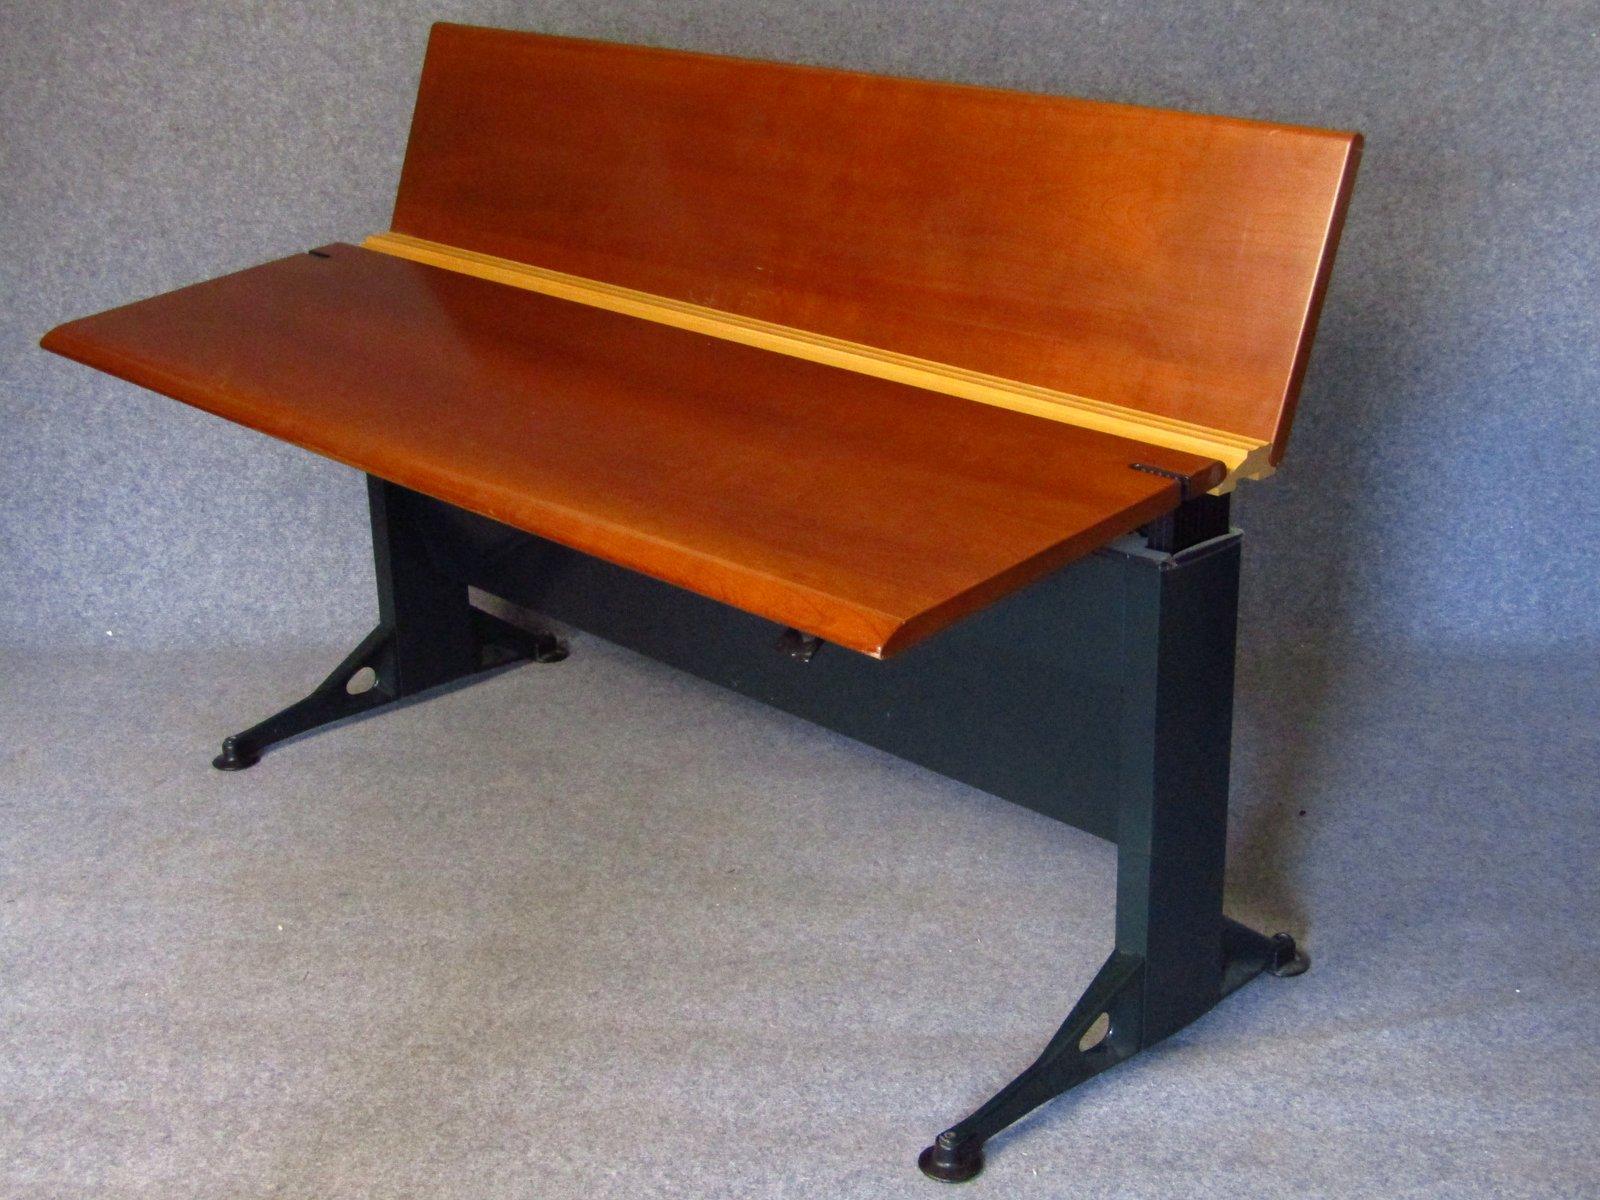 Beech Veneered Adjule Desk By Geoff Hollington For Herman Miller 1970s